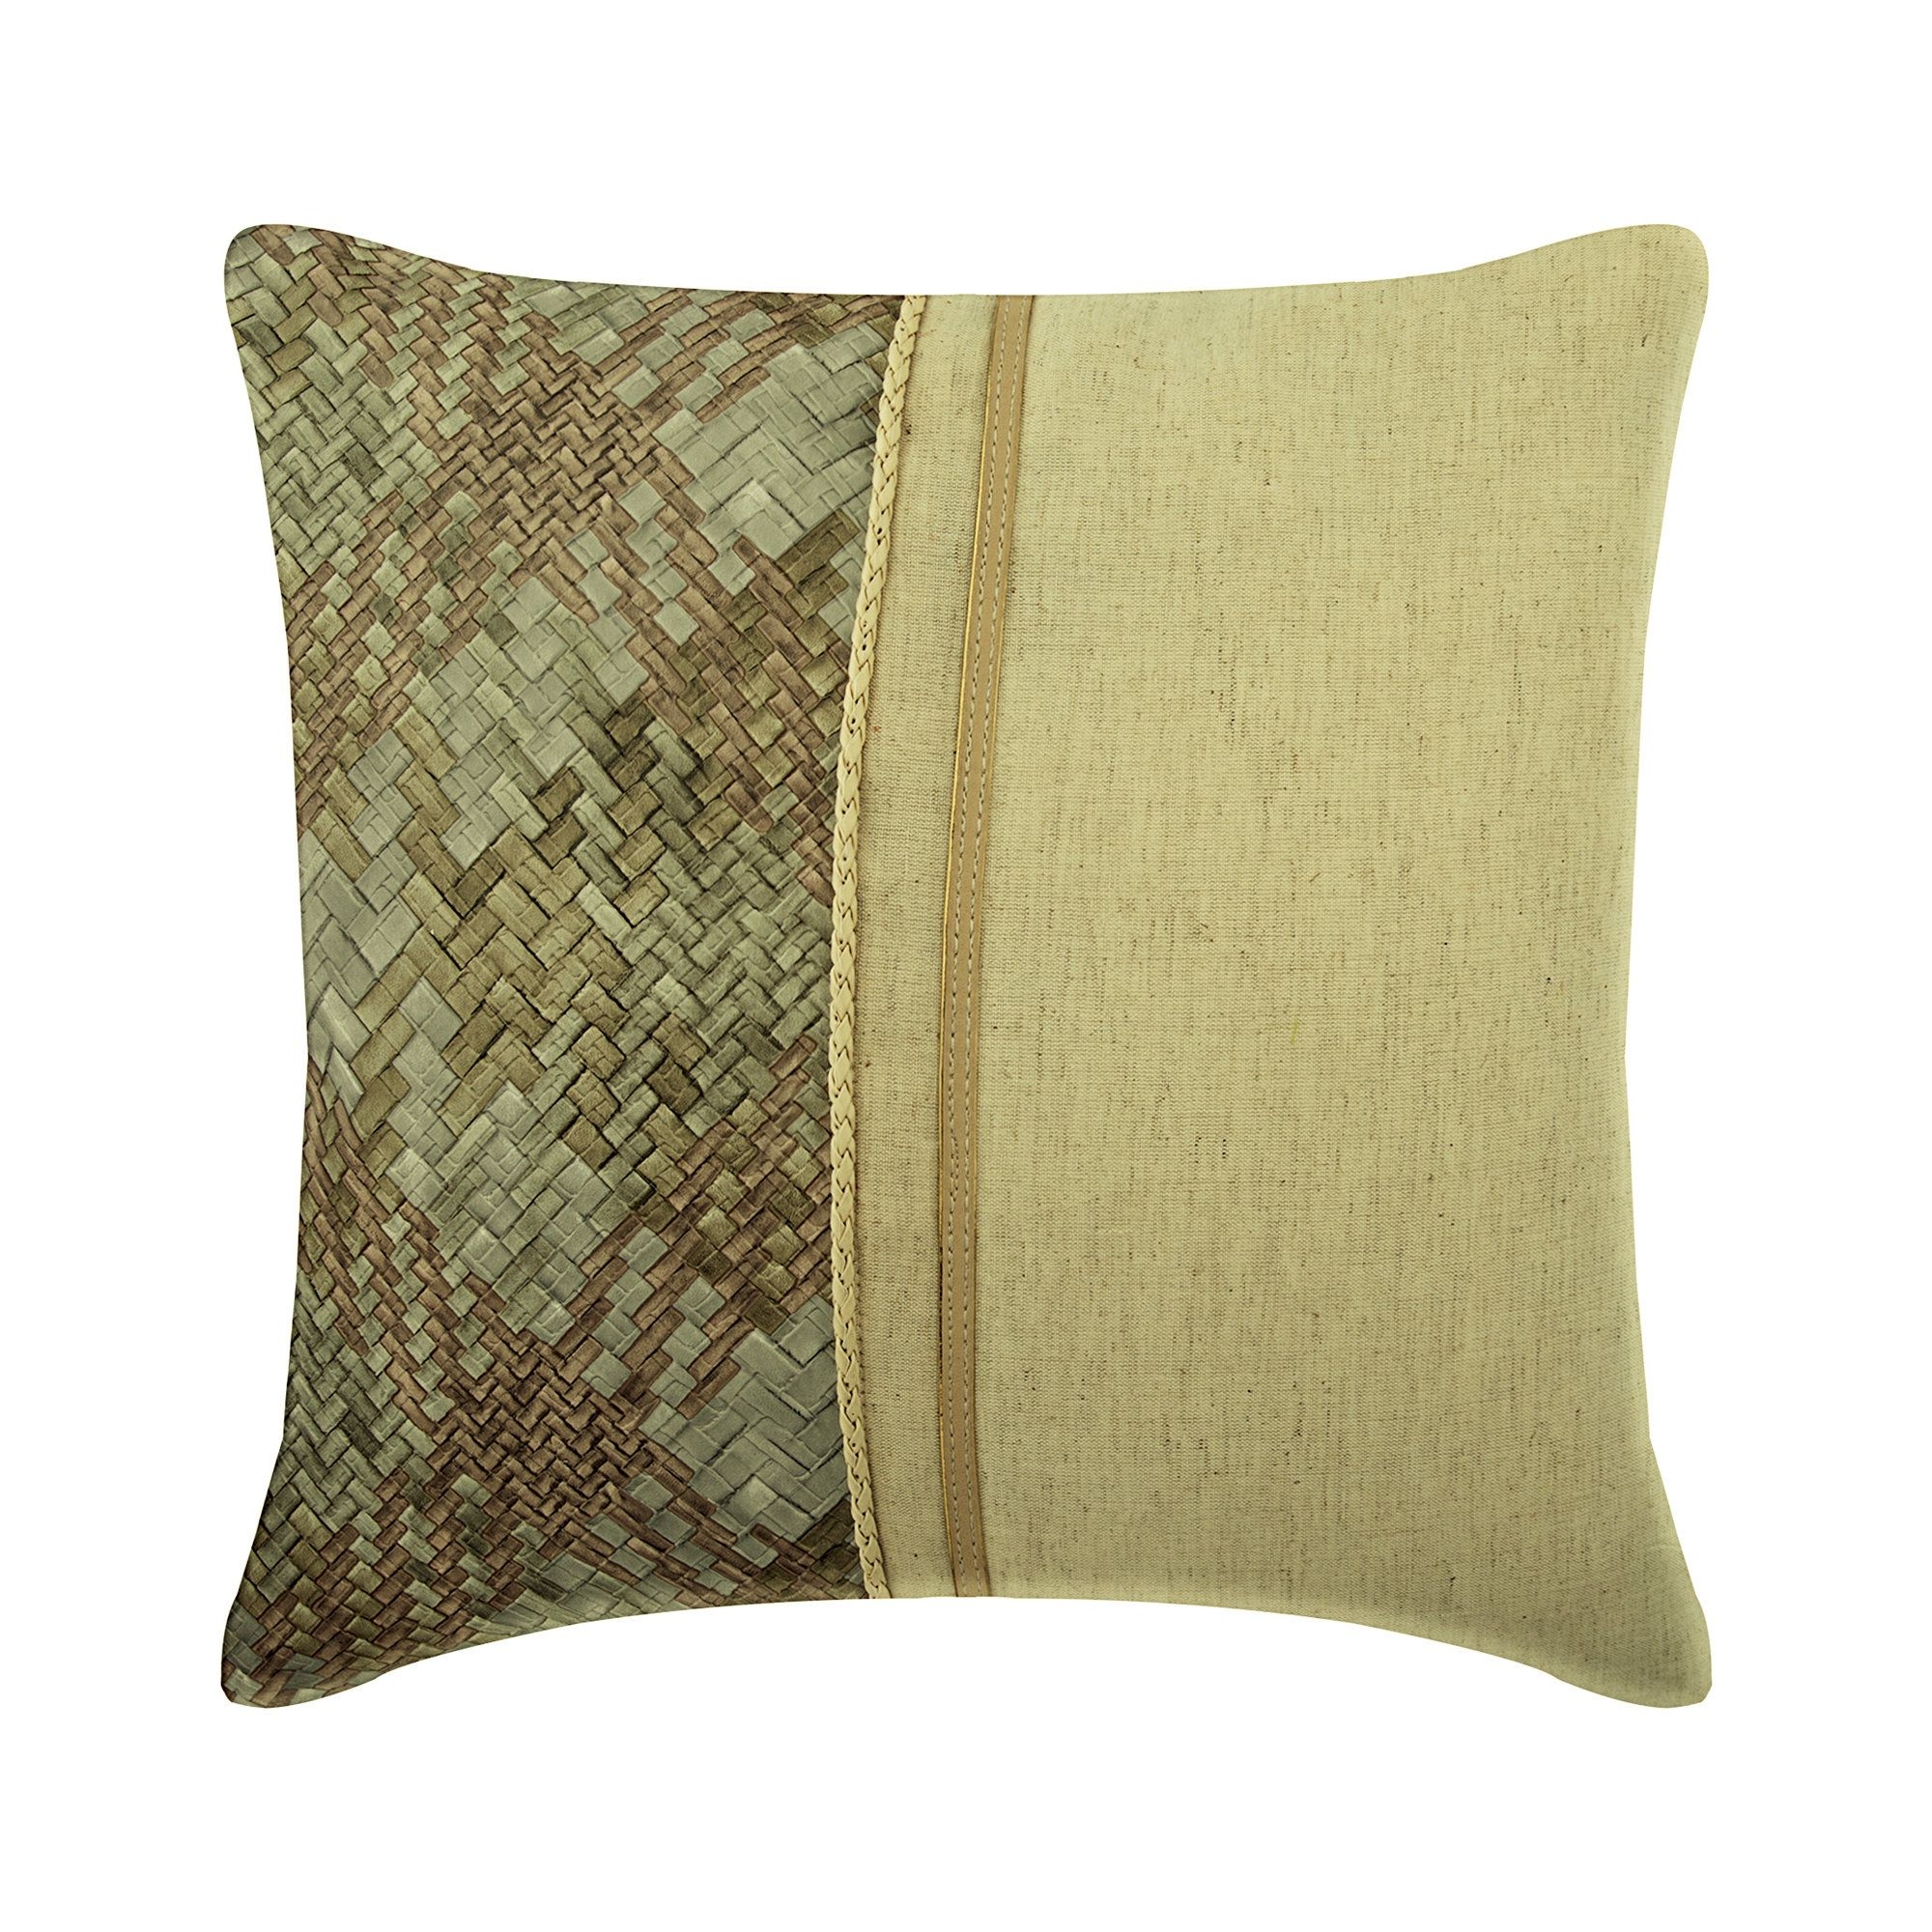 Luxury Beige Throw Cushion 16x16 Linen Faux Etsy Leather